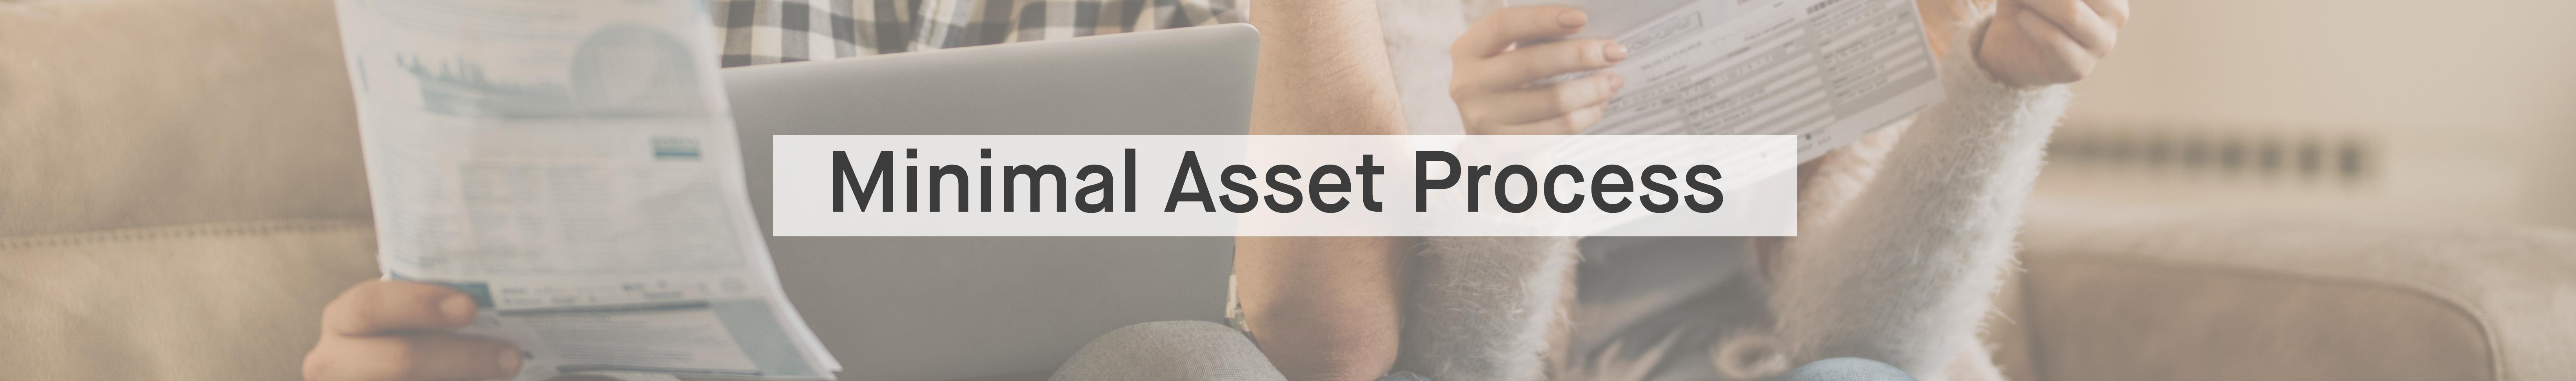 Minimal Asset Process-Img